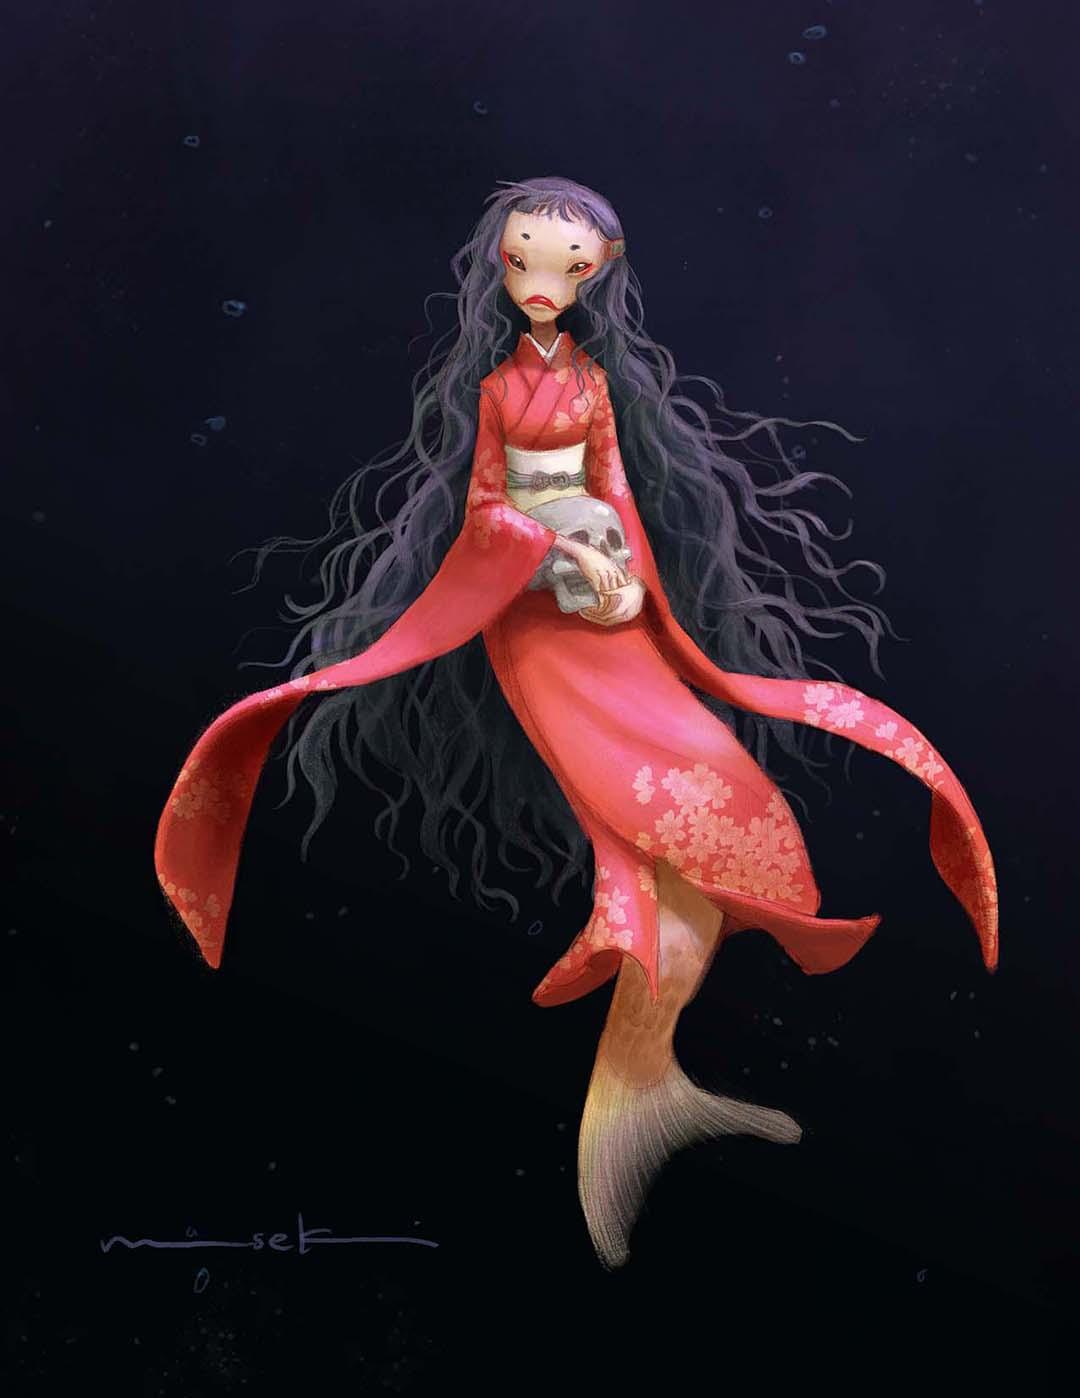 GirlsclubAsia-Artist-MasaeSeki-MS01.jpg